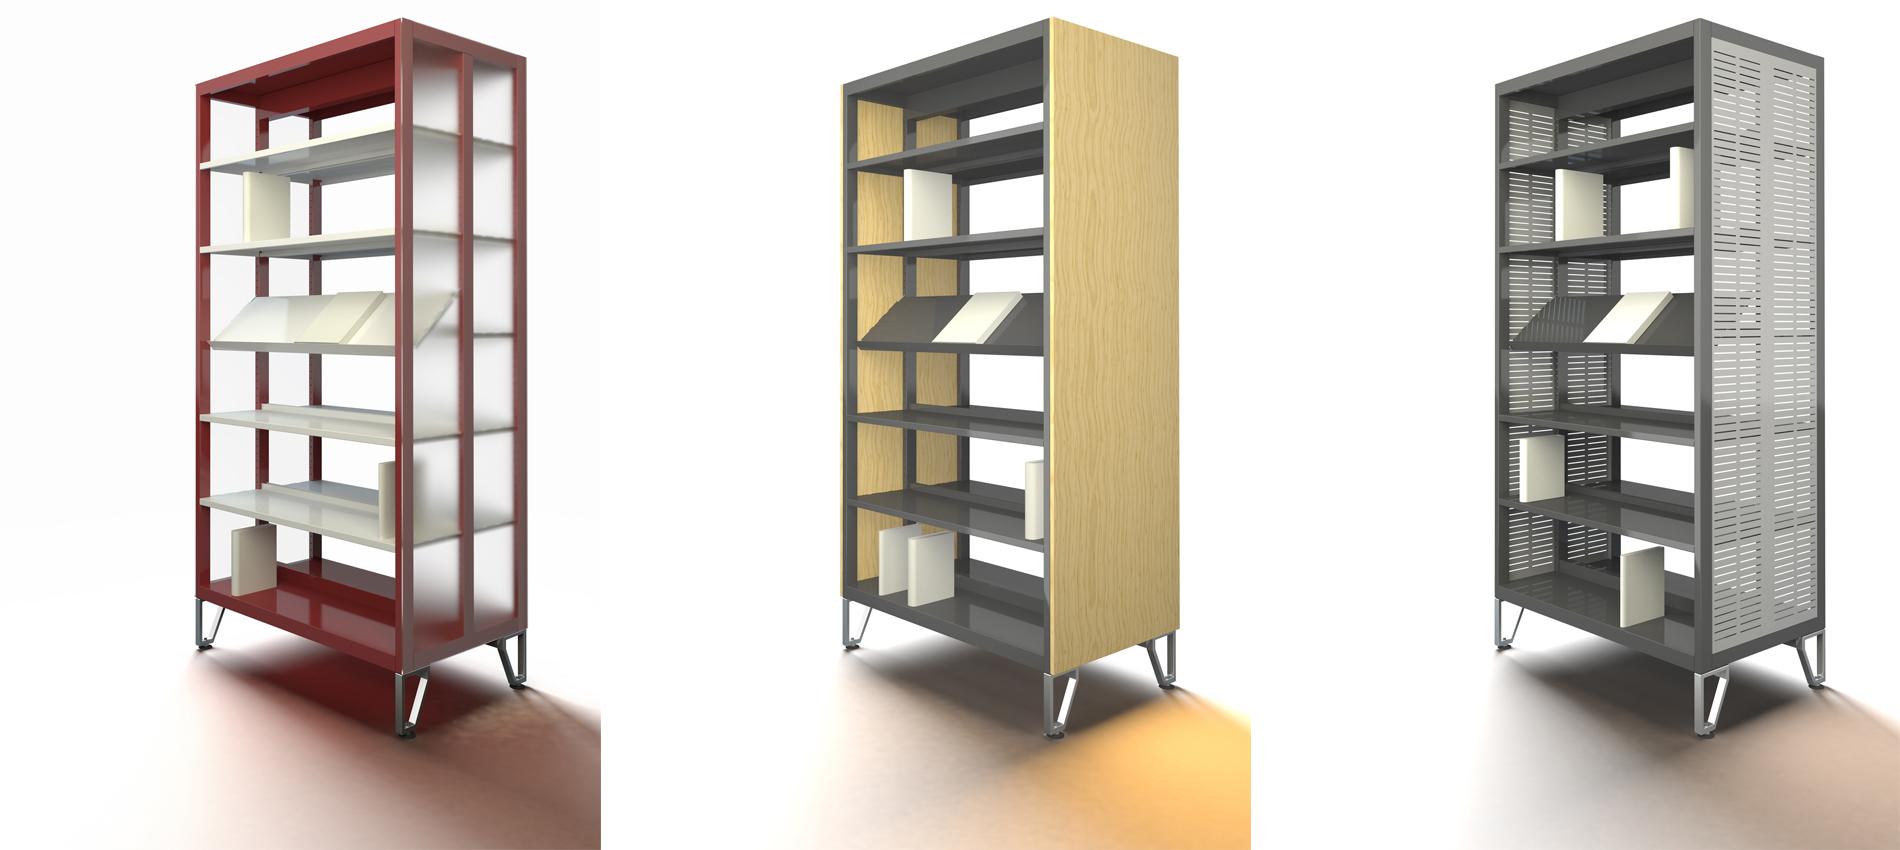 Sistema arredo biblioteche alterstudio partners for Arredi per biblioteche